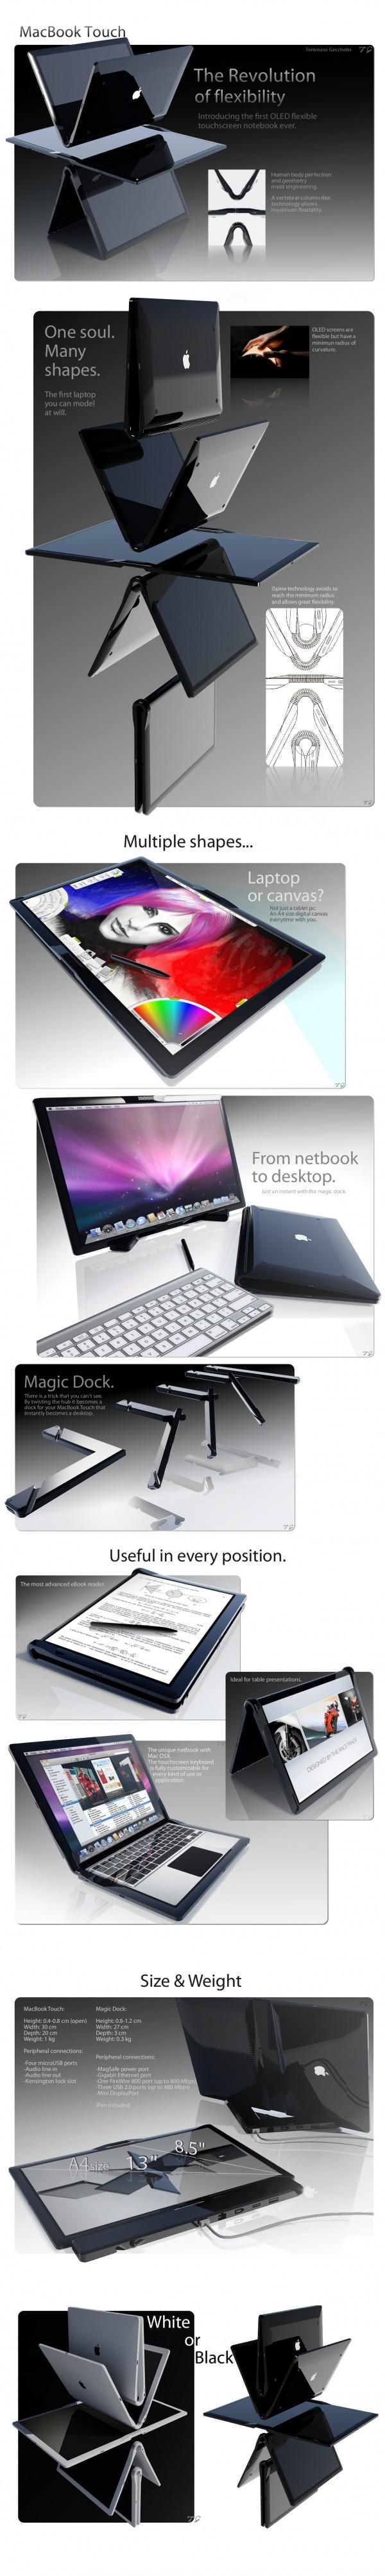 foldable-macbook-concept-designs-2